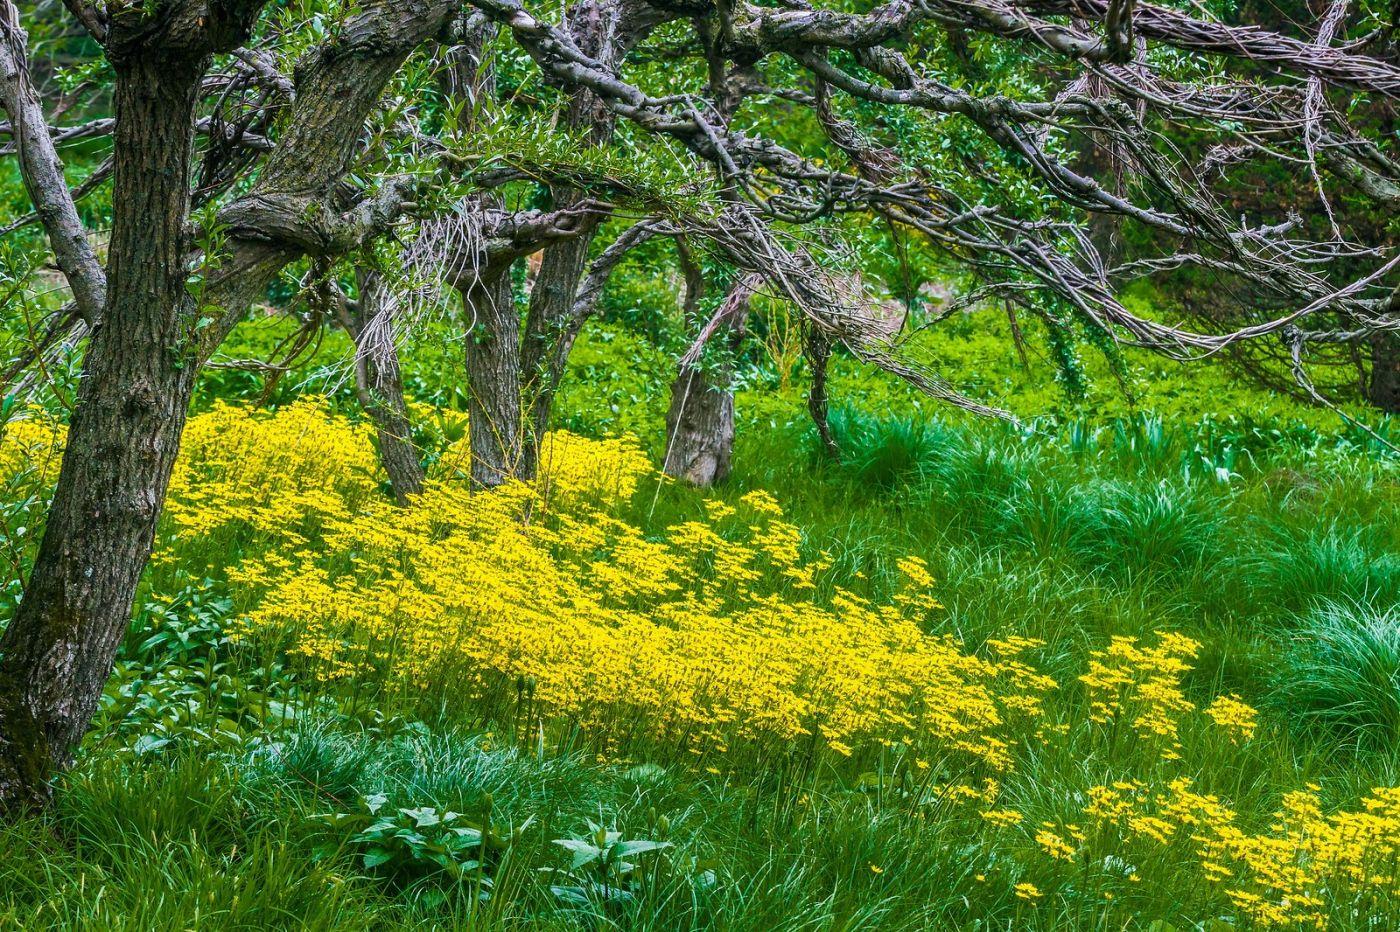 Chanticleer花园,有梦想的季节_图1-33